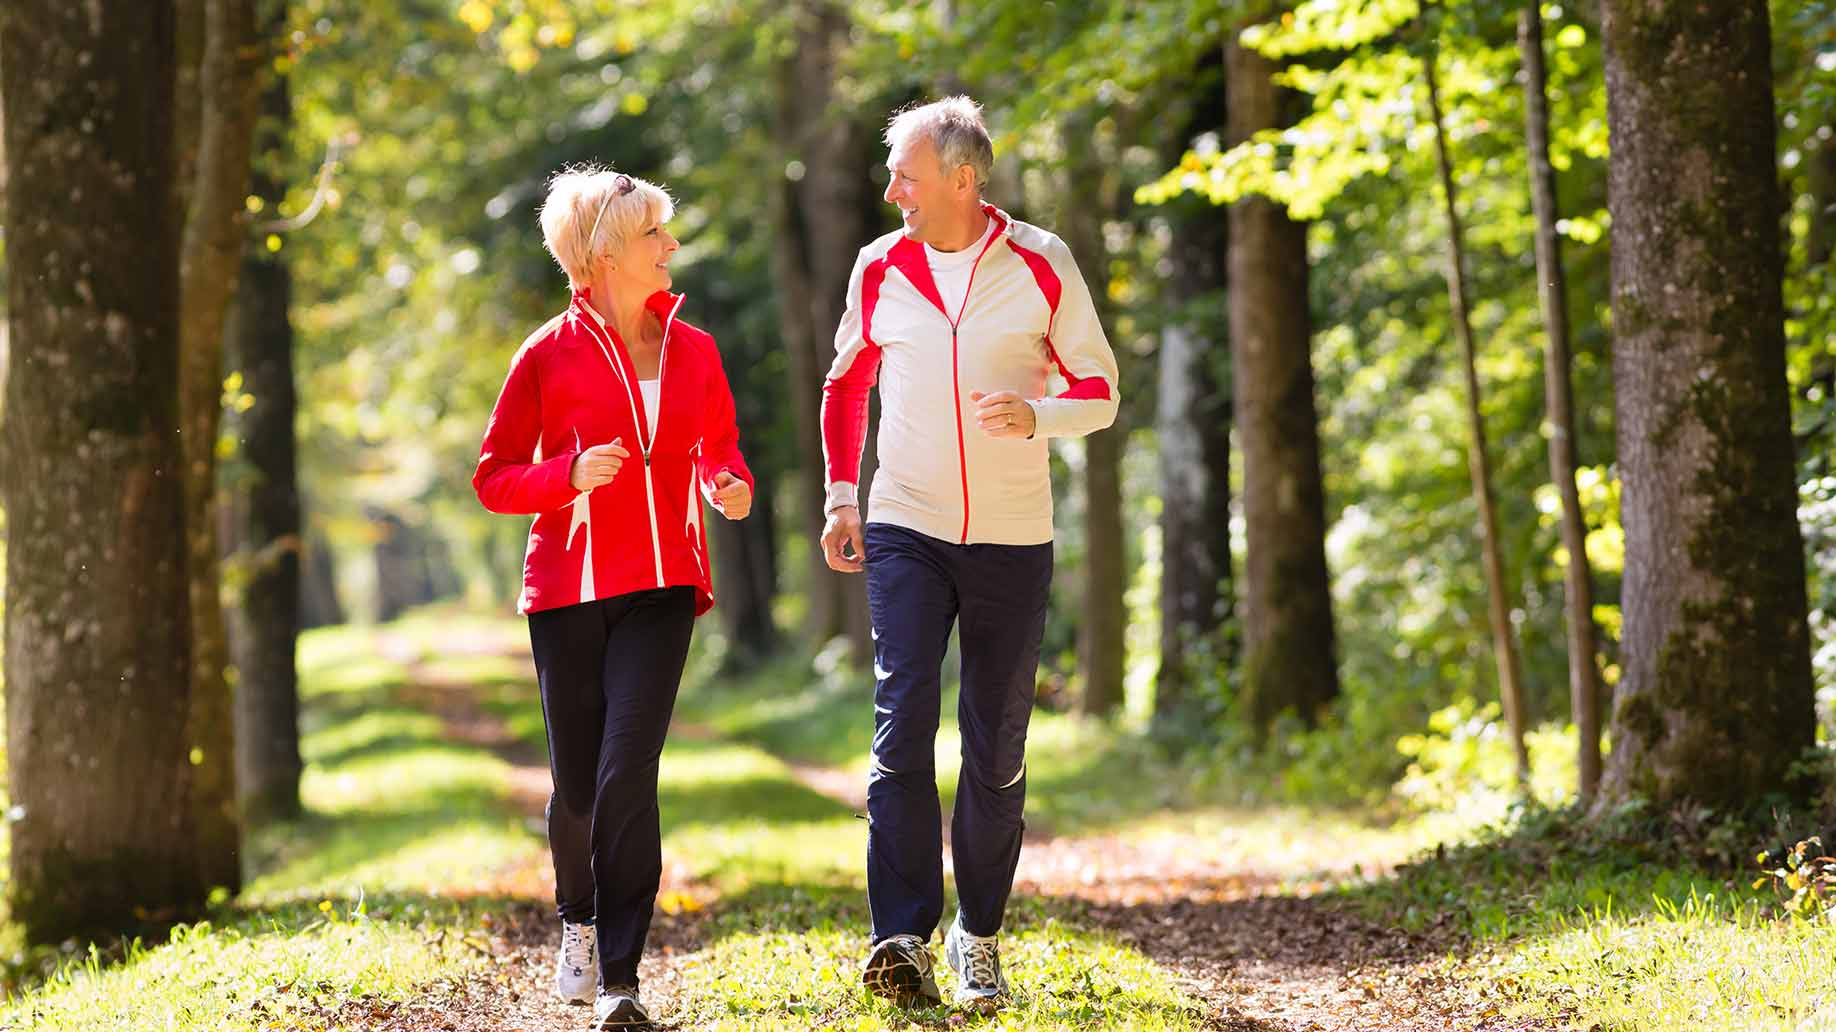 moderate intensity workouts aerobic resistance exercise jogging elderly arthritis natural remedies